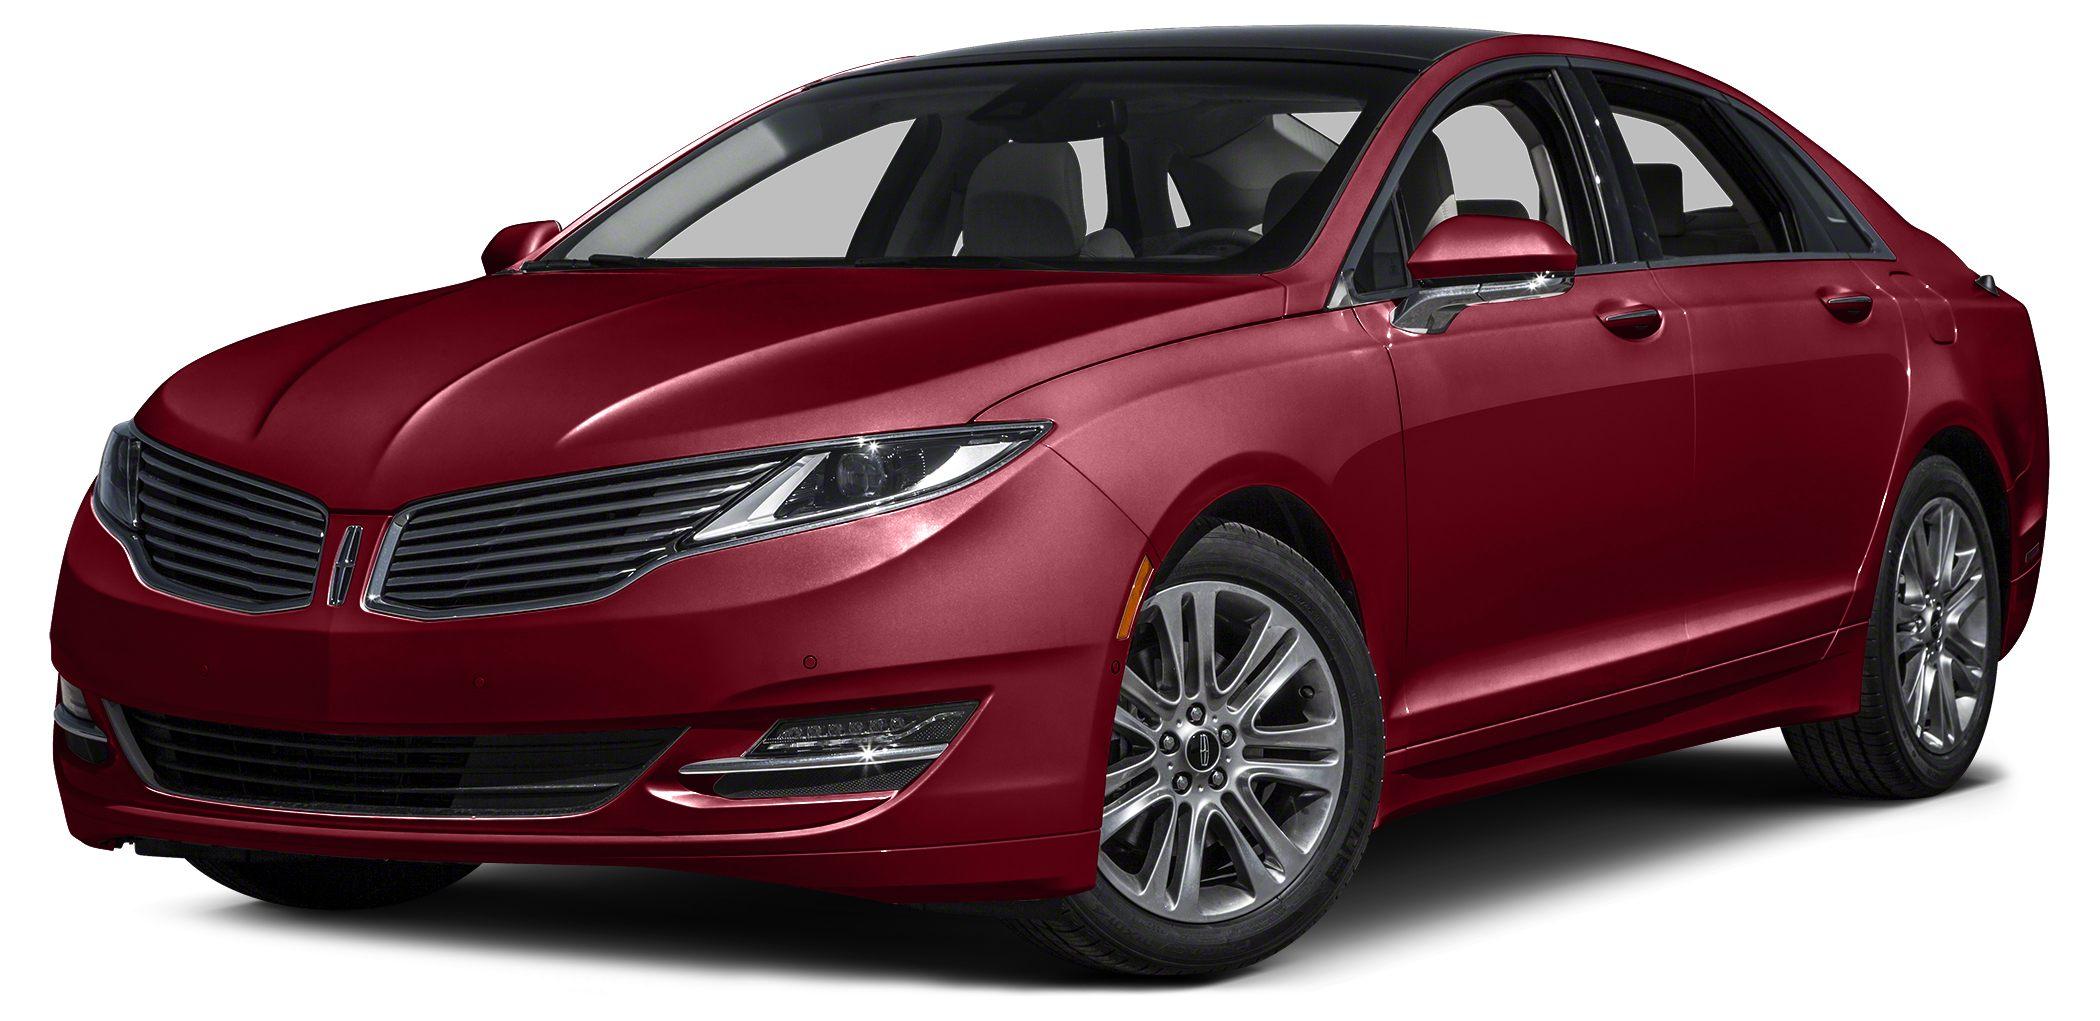 2016 Lincoln MKZ Base Miles 3774Color Red Stock 966 VIN 3LN6L2G98GR611966